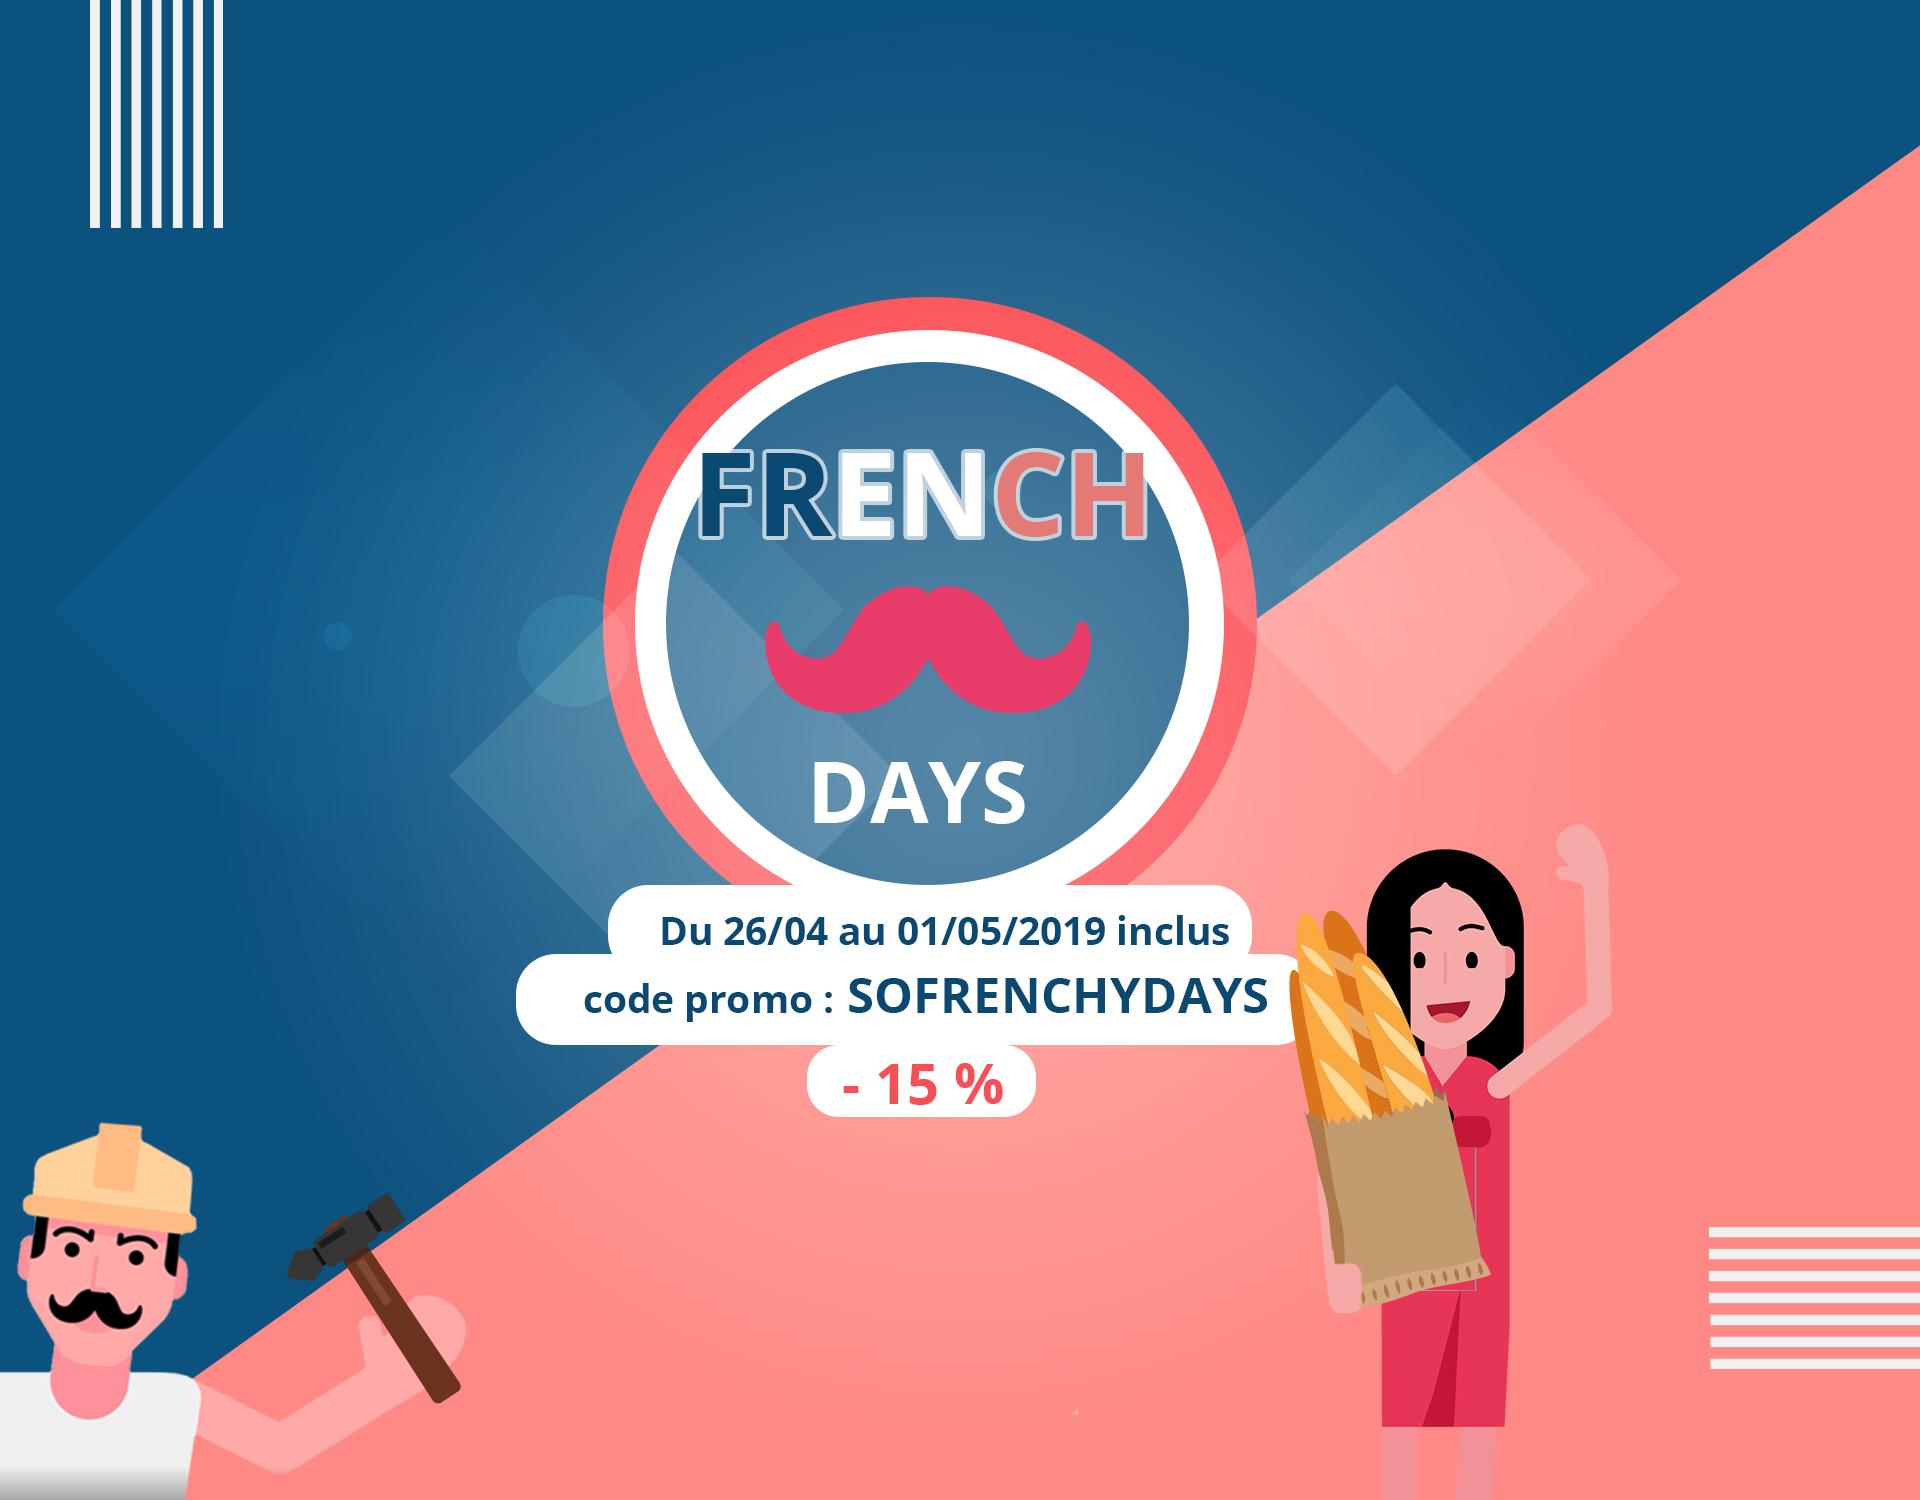 french-days-code-promo-john-steel